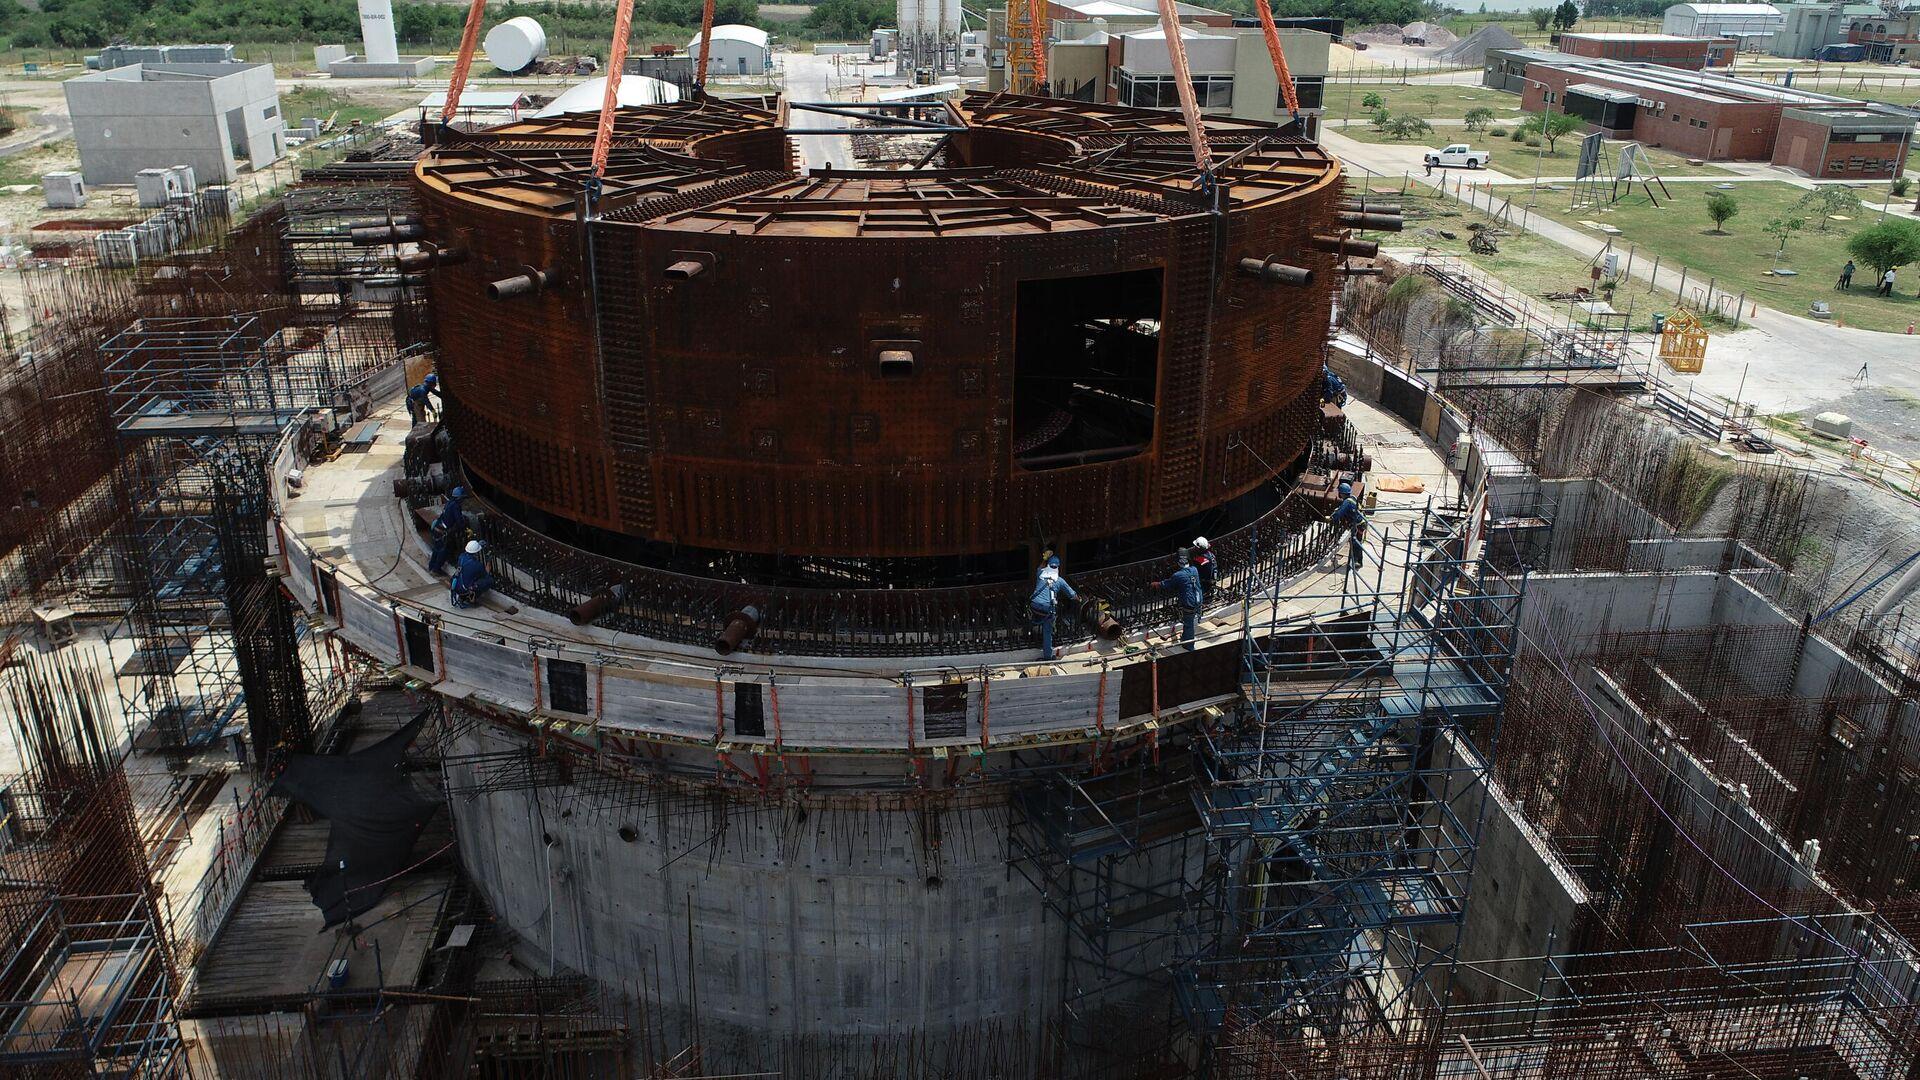 El reactor de baja potencia CAREM - Sputnik Mundo, 1920, 06.07.2021